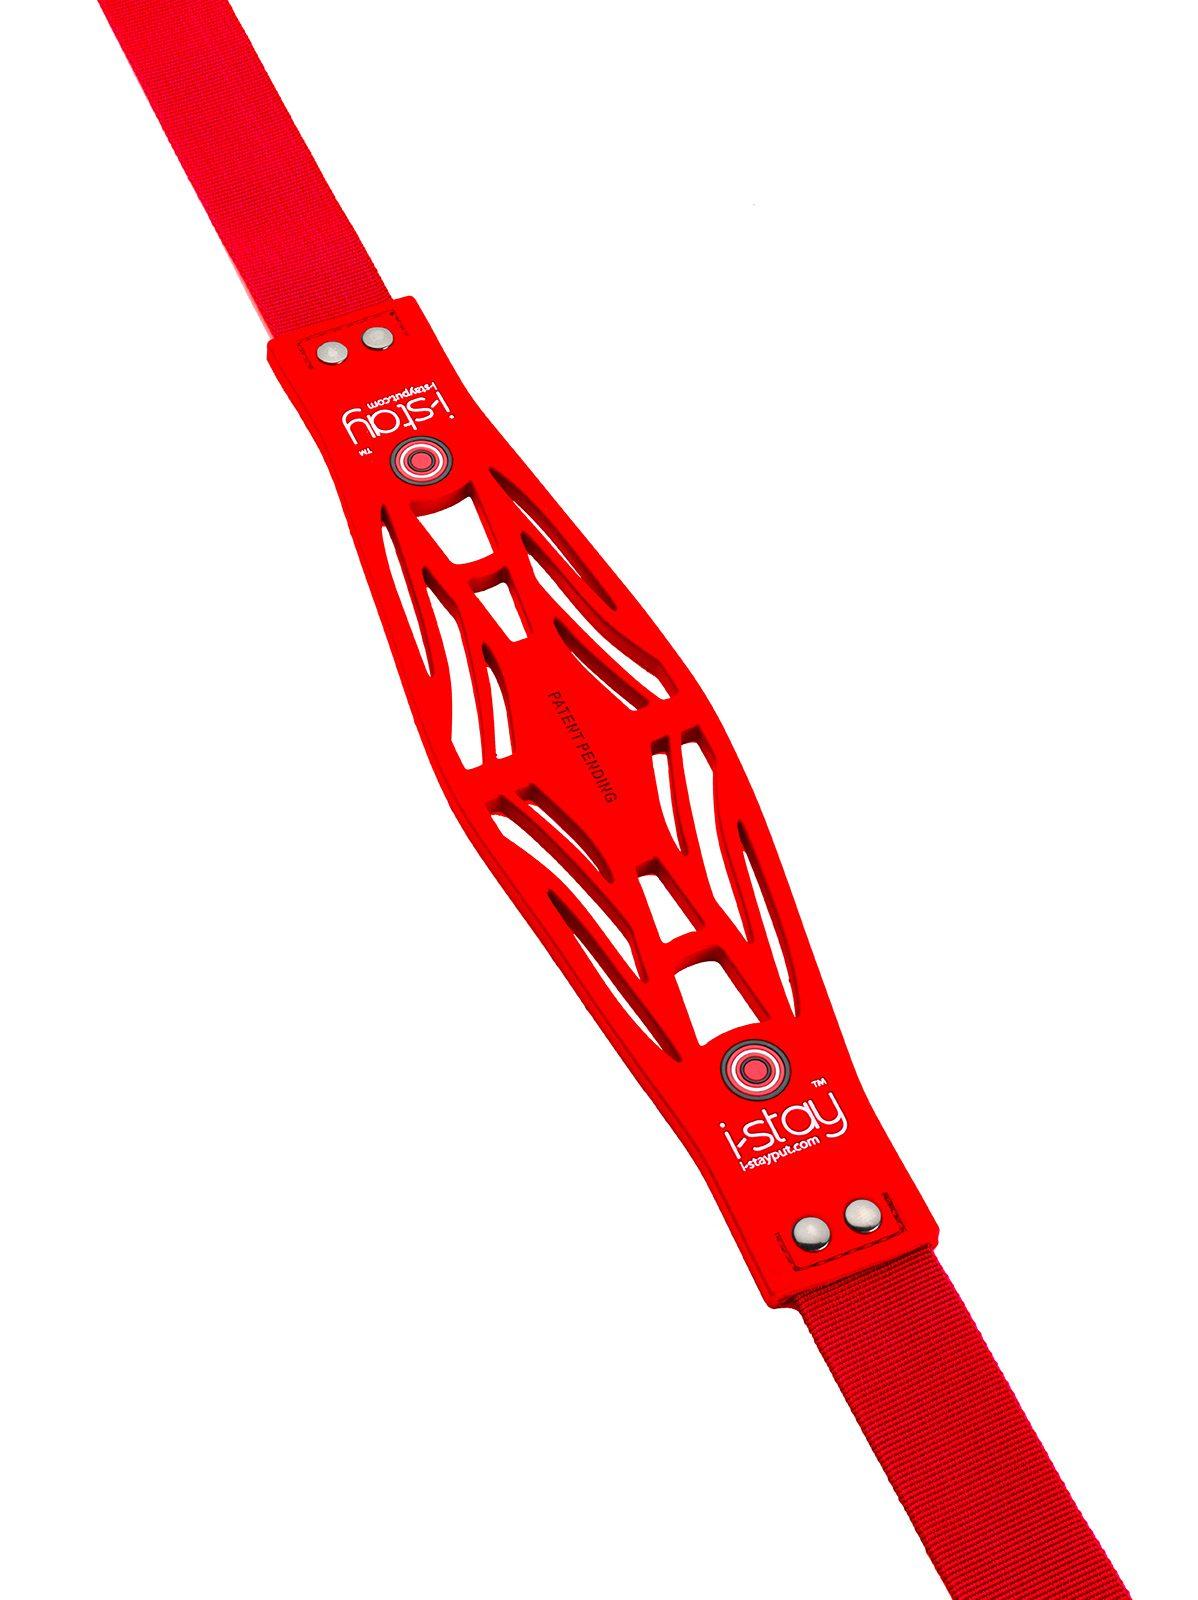 i-stay non slip bag strap red